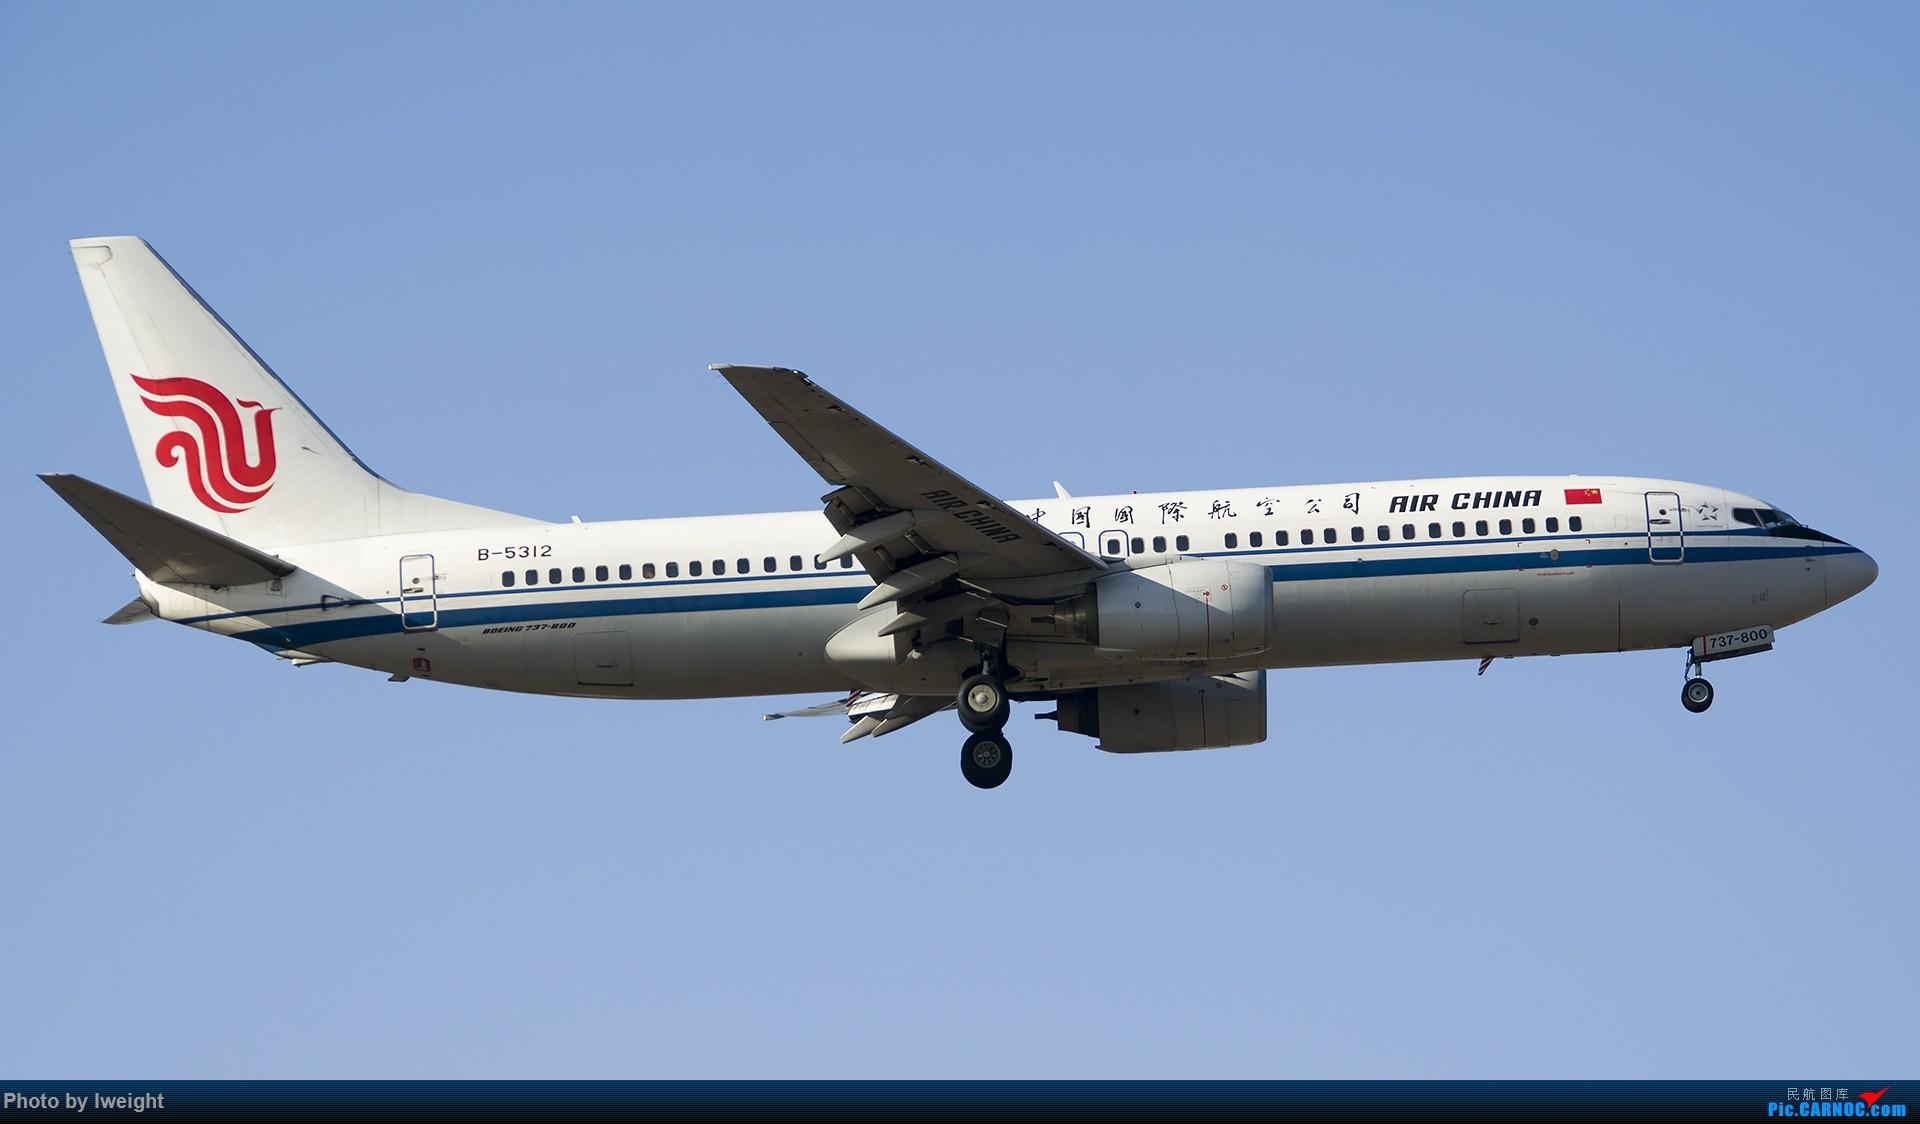 Re:[原创]庆祝升级777,发上今天在首都机场拍的所有飞机【2014-12-14】 BOEING 737-800 B-5312 中国北京首都国际机场